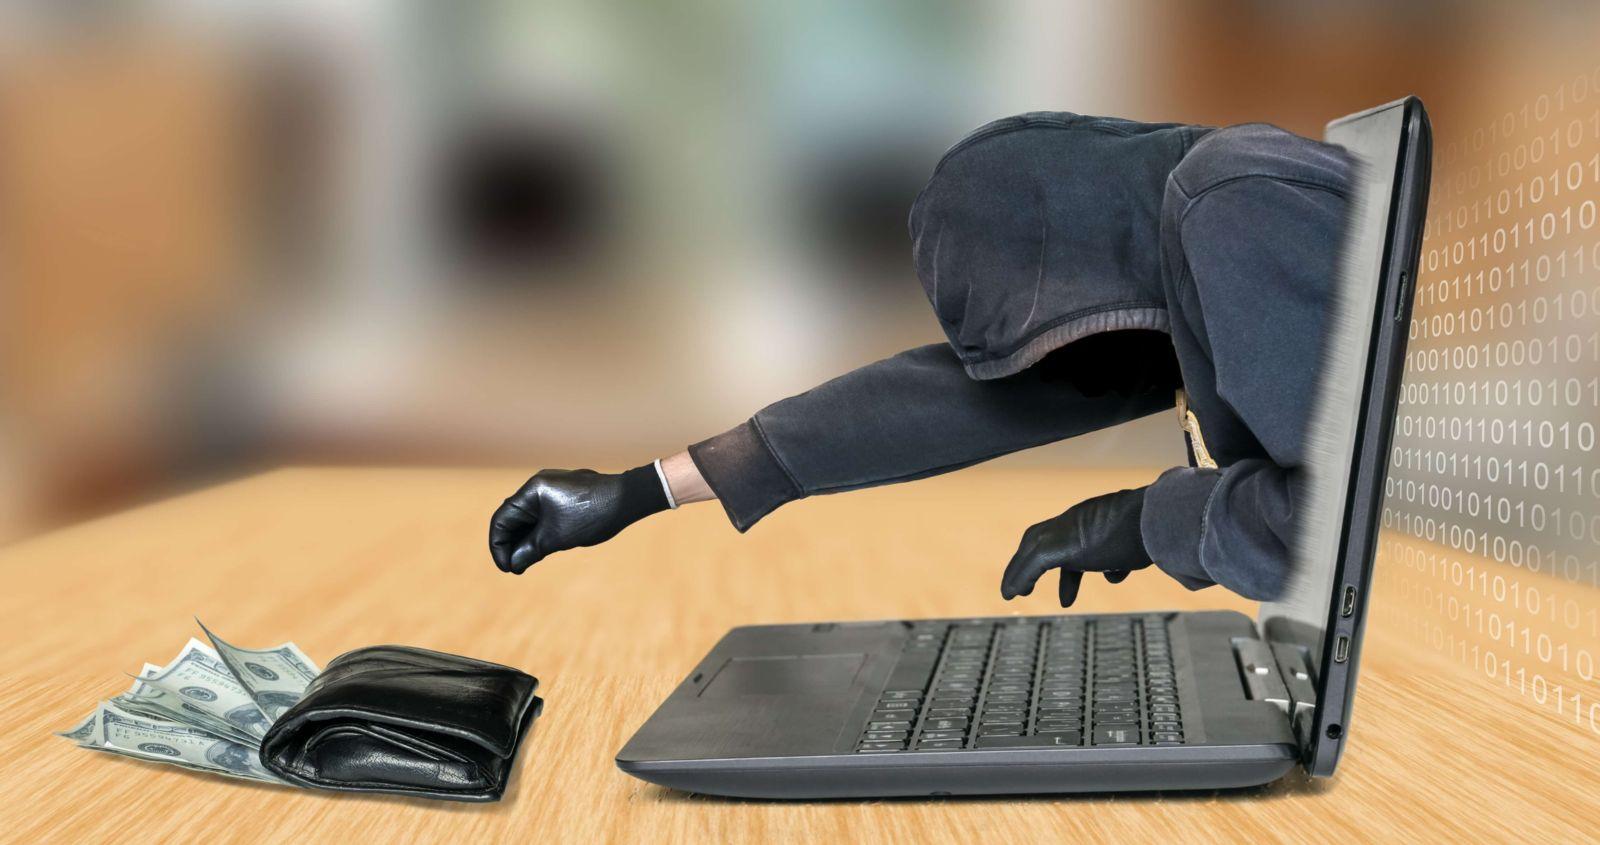 Credit Identity Theft